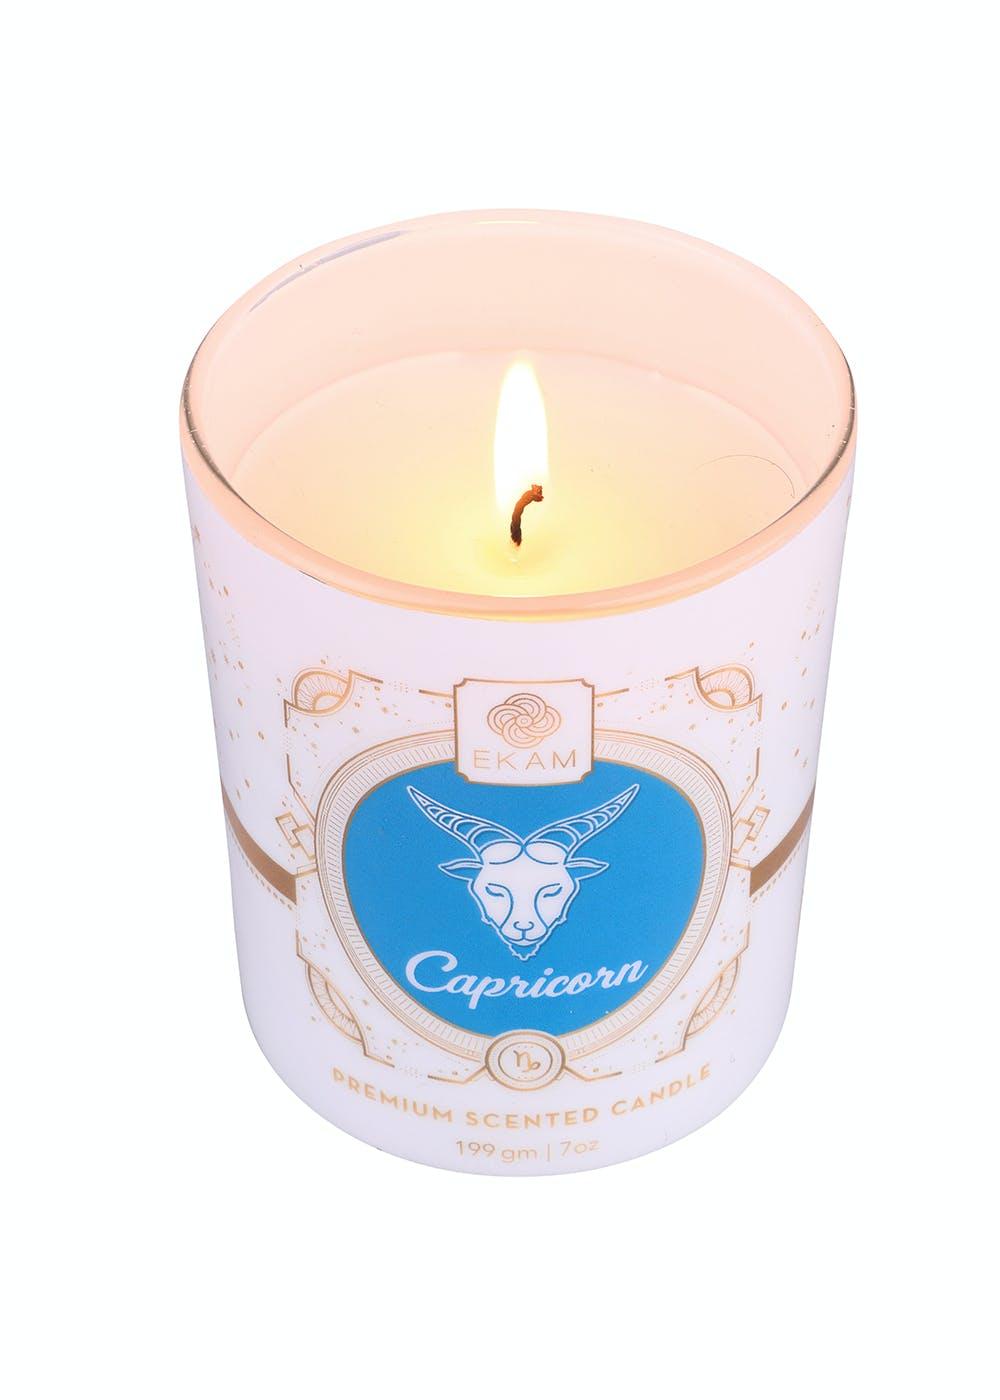 Capricorn Zodiac Scented Candle - 199g